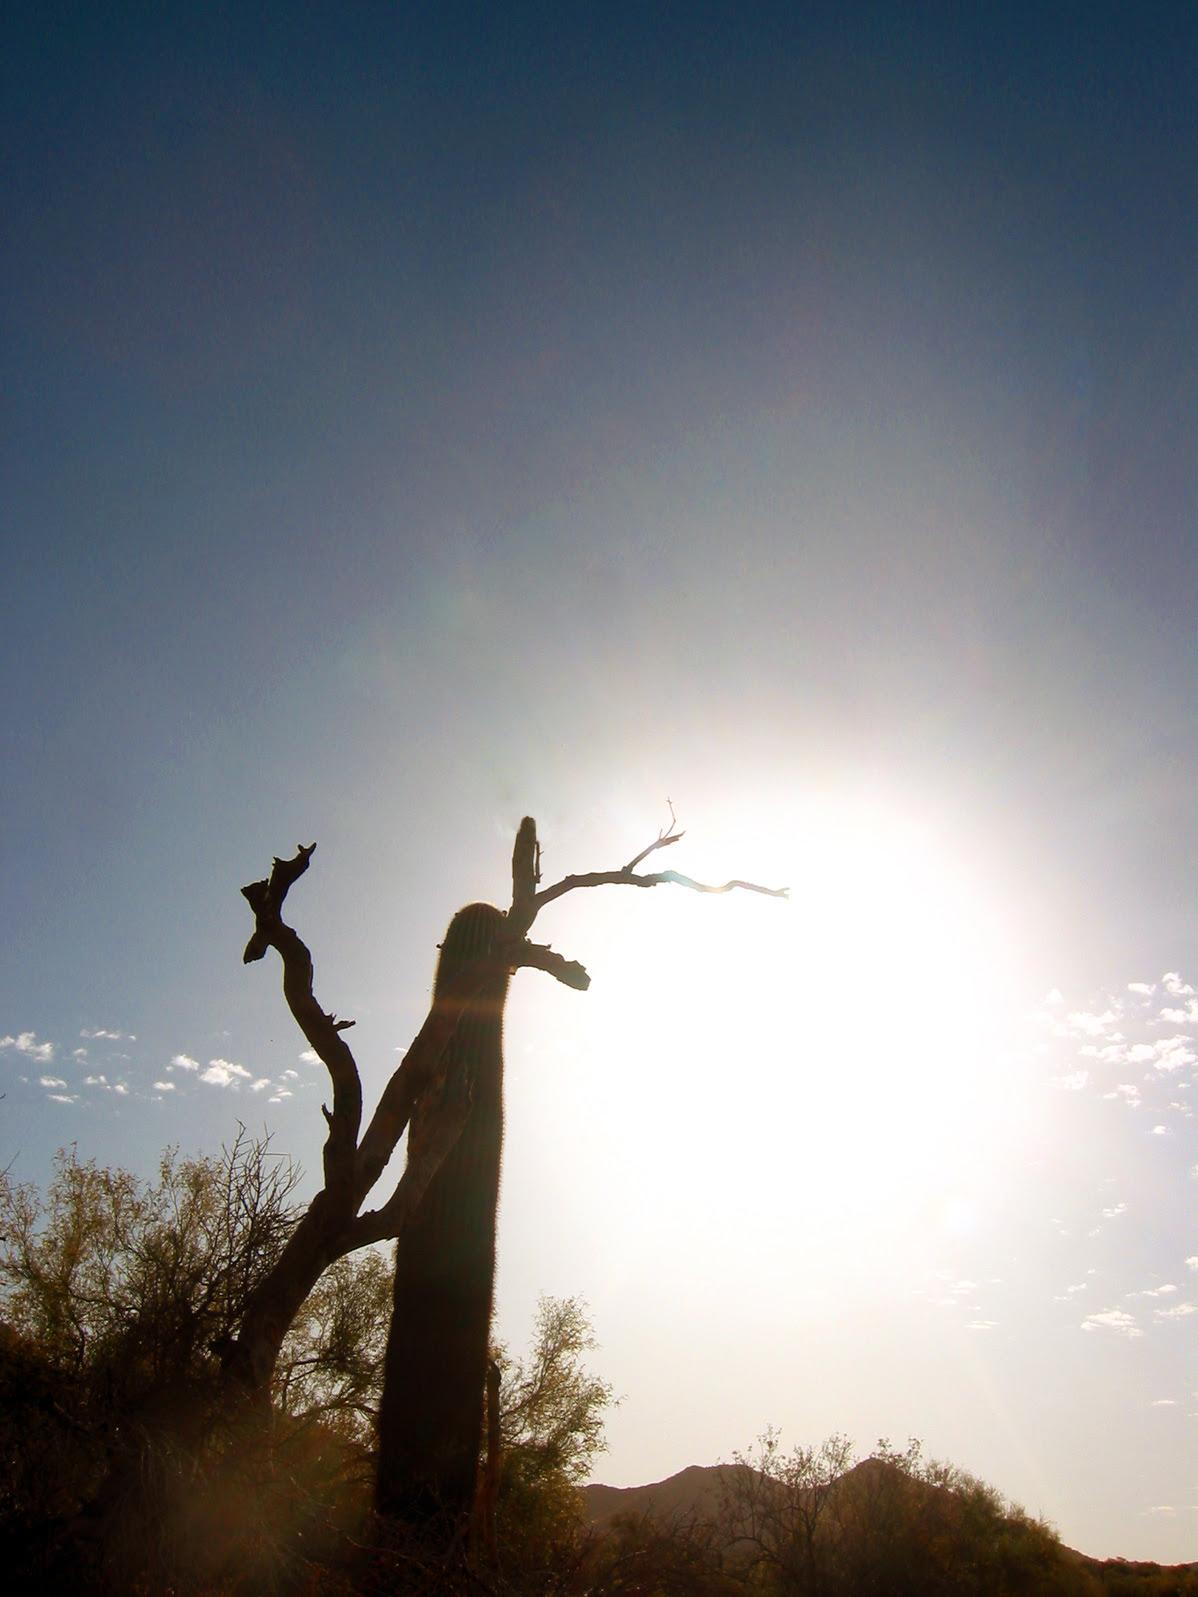 Arizona Desert at Sunrise Photo - soul-amp.com